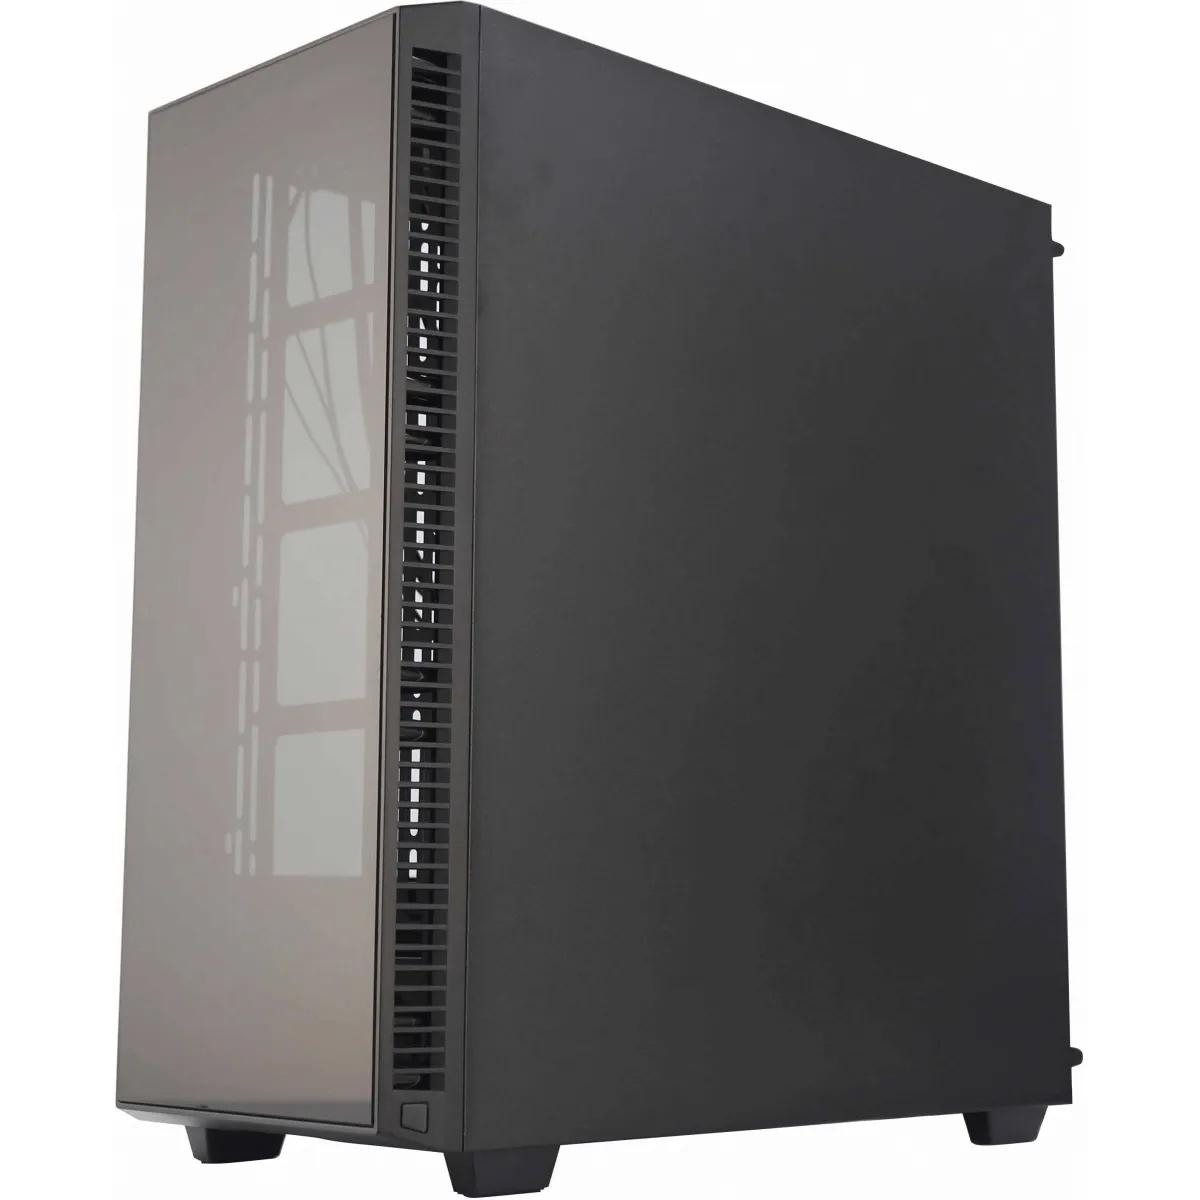 Gabinete Gamer Redragon Grapple Mid Tower S-Fan Vidro Temperado Black GC-607-BK